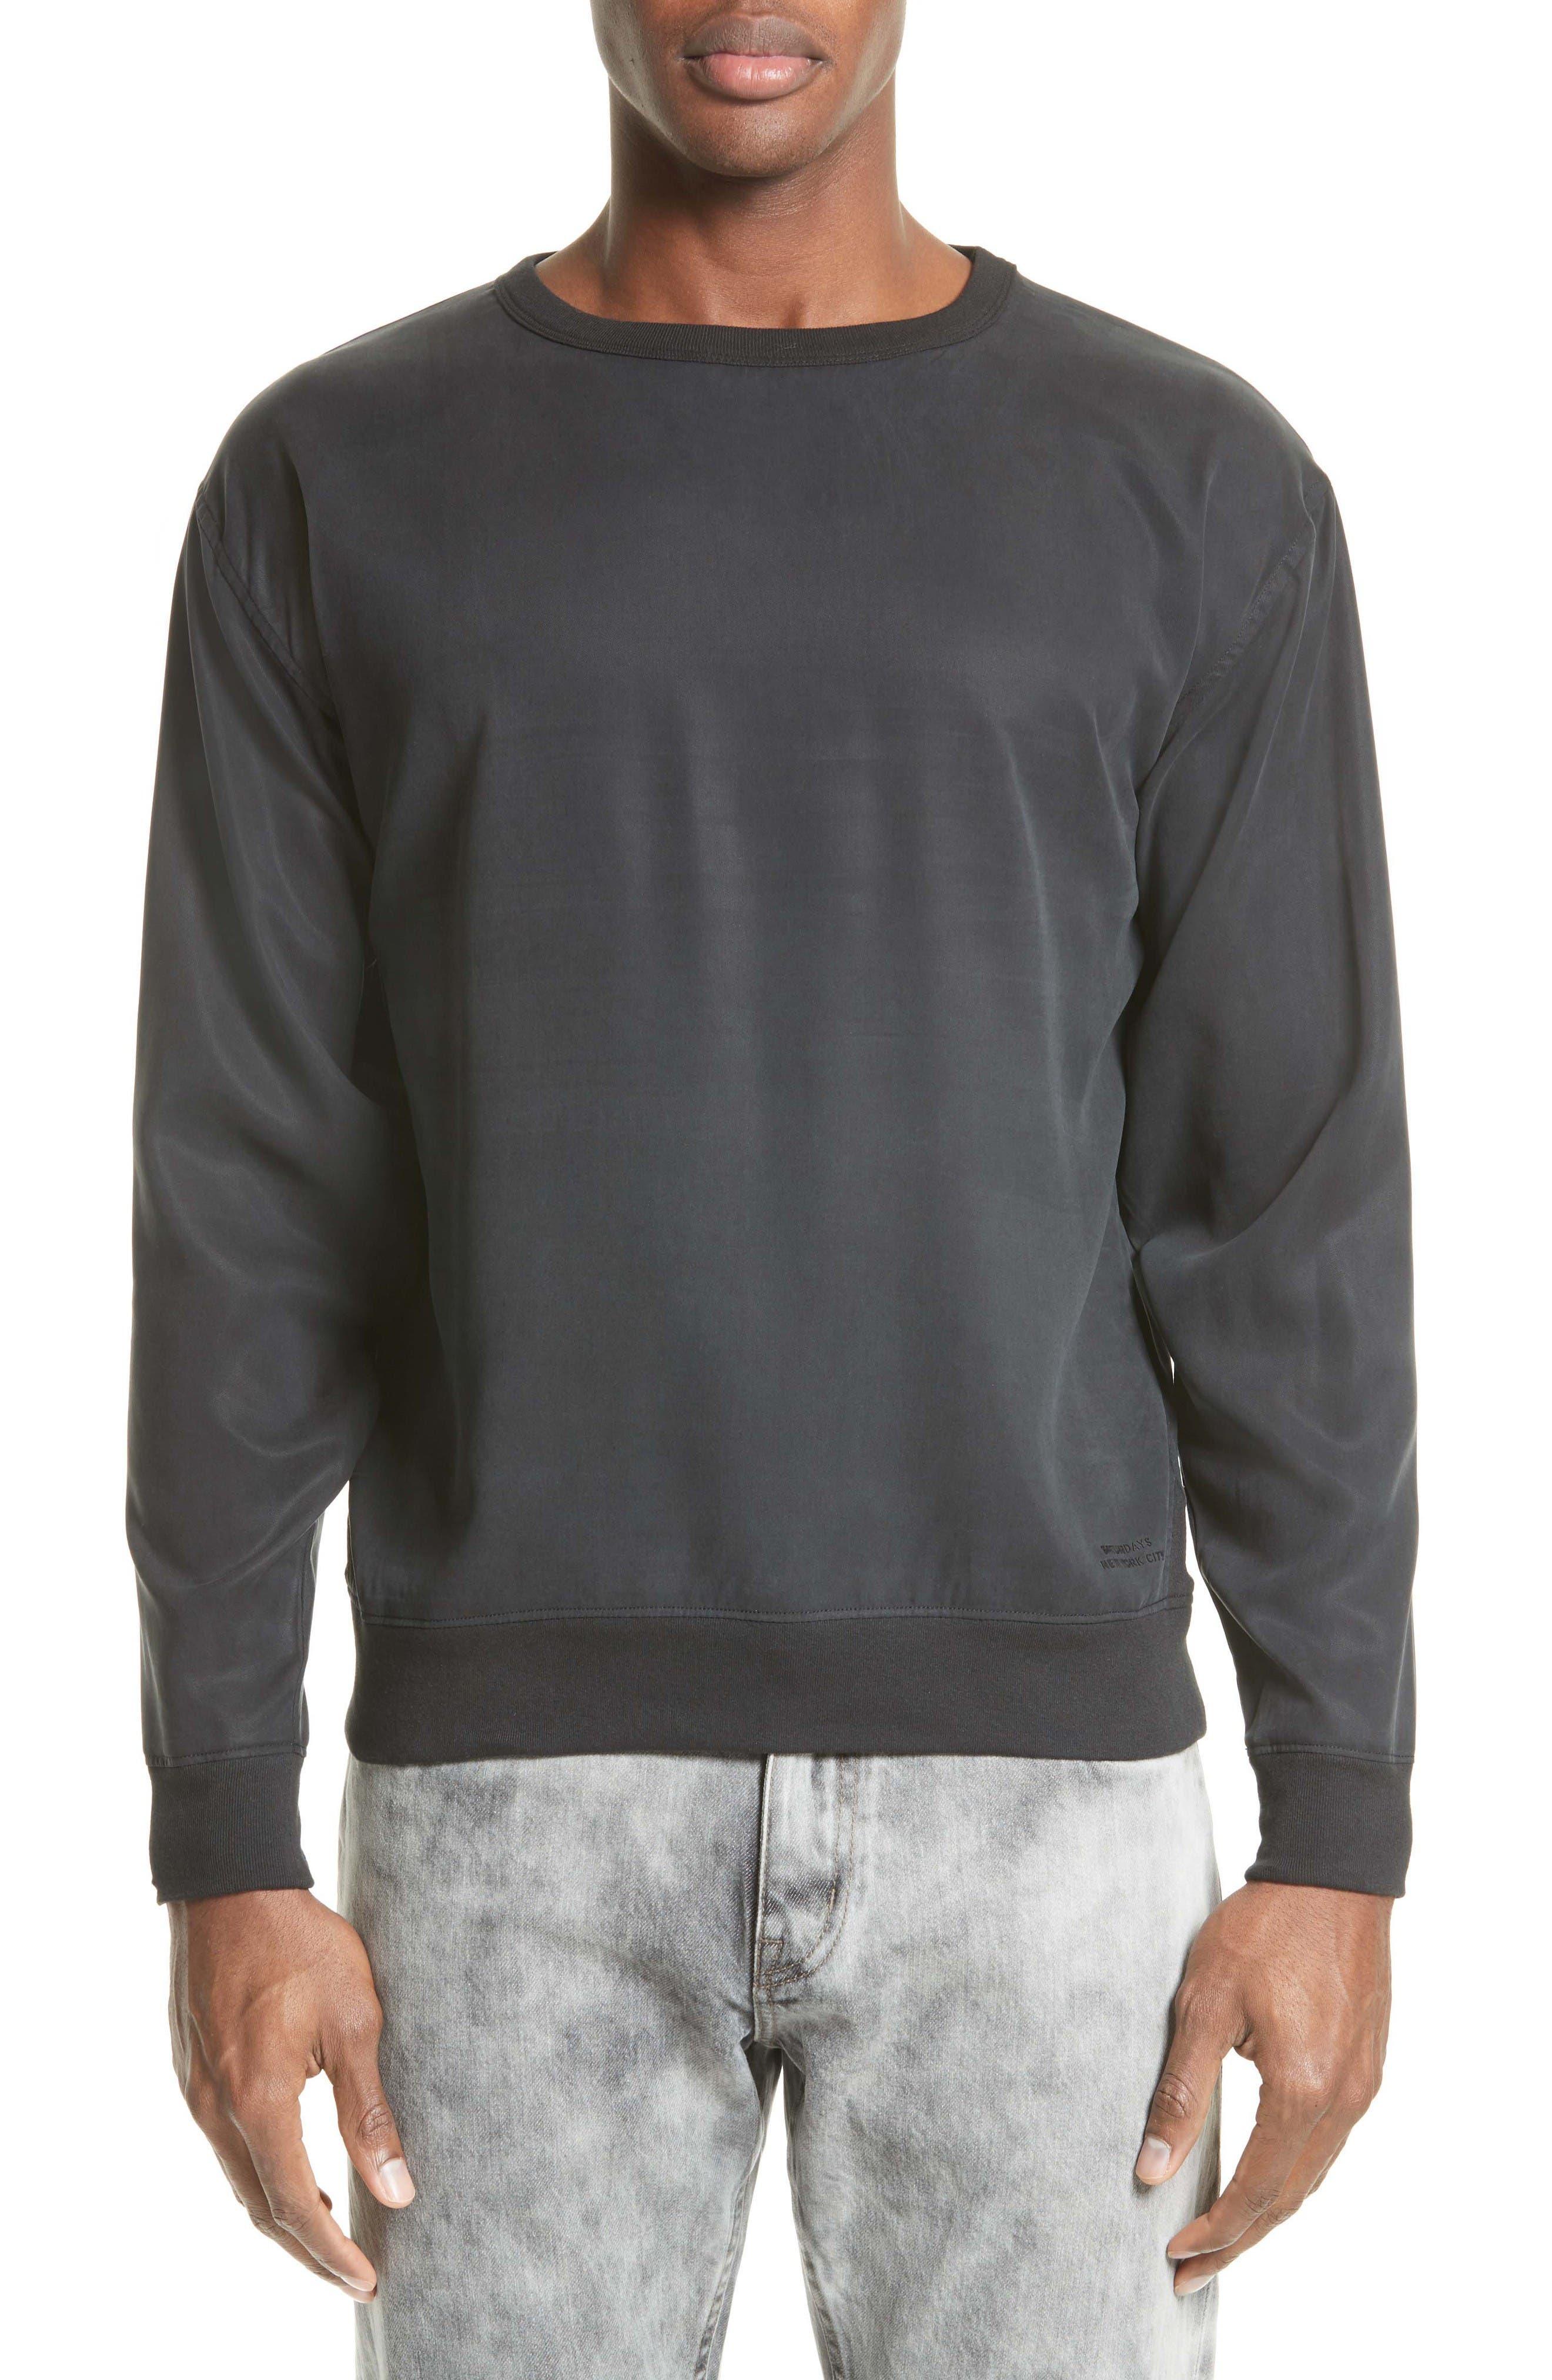 Saturdays NYC Duey Twill Crewneck Sweatshirt